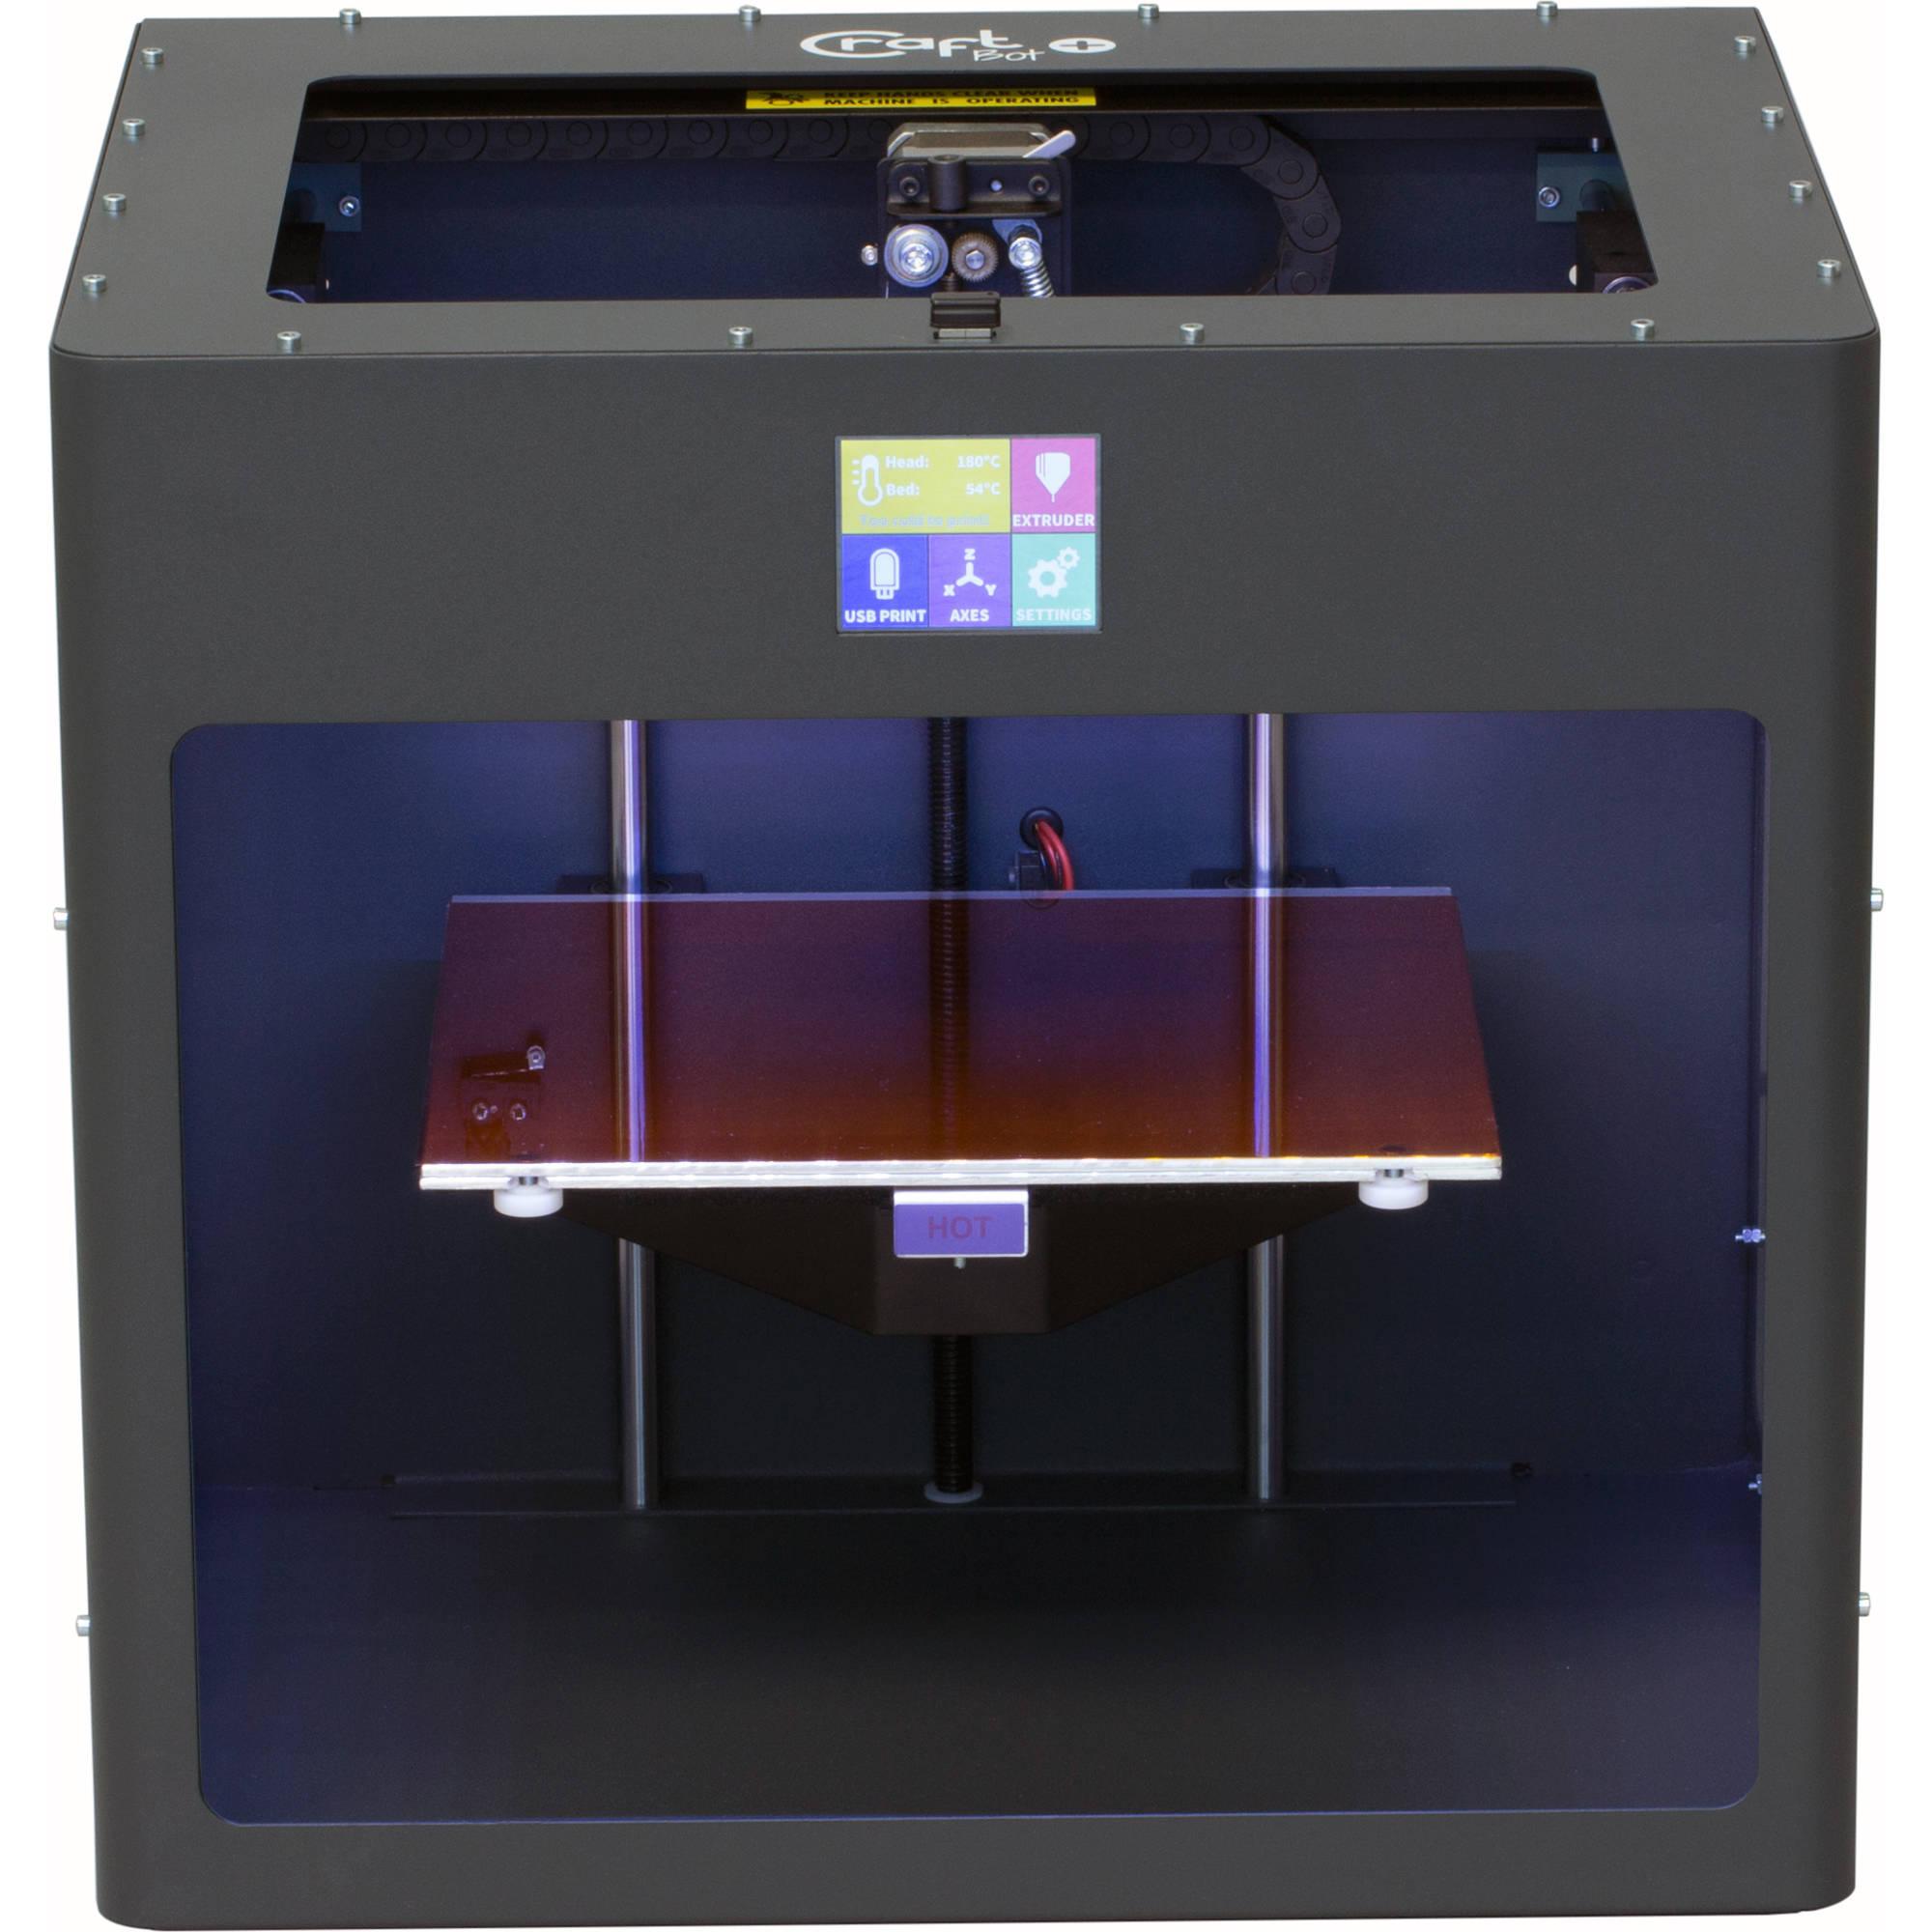 craftbot craftbot plus 3d printer anthracite gray pr 999 009